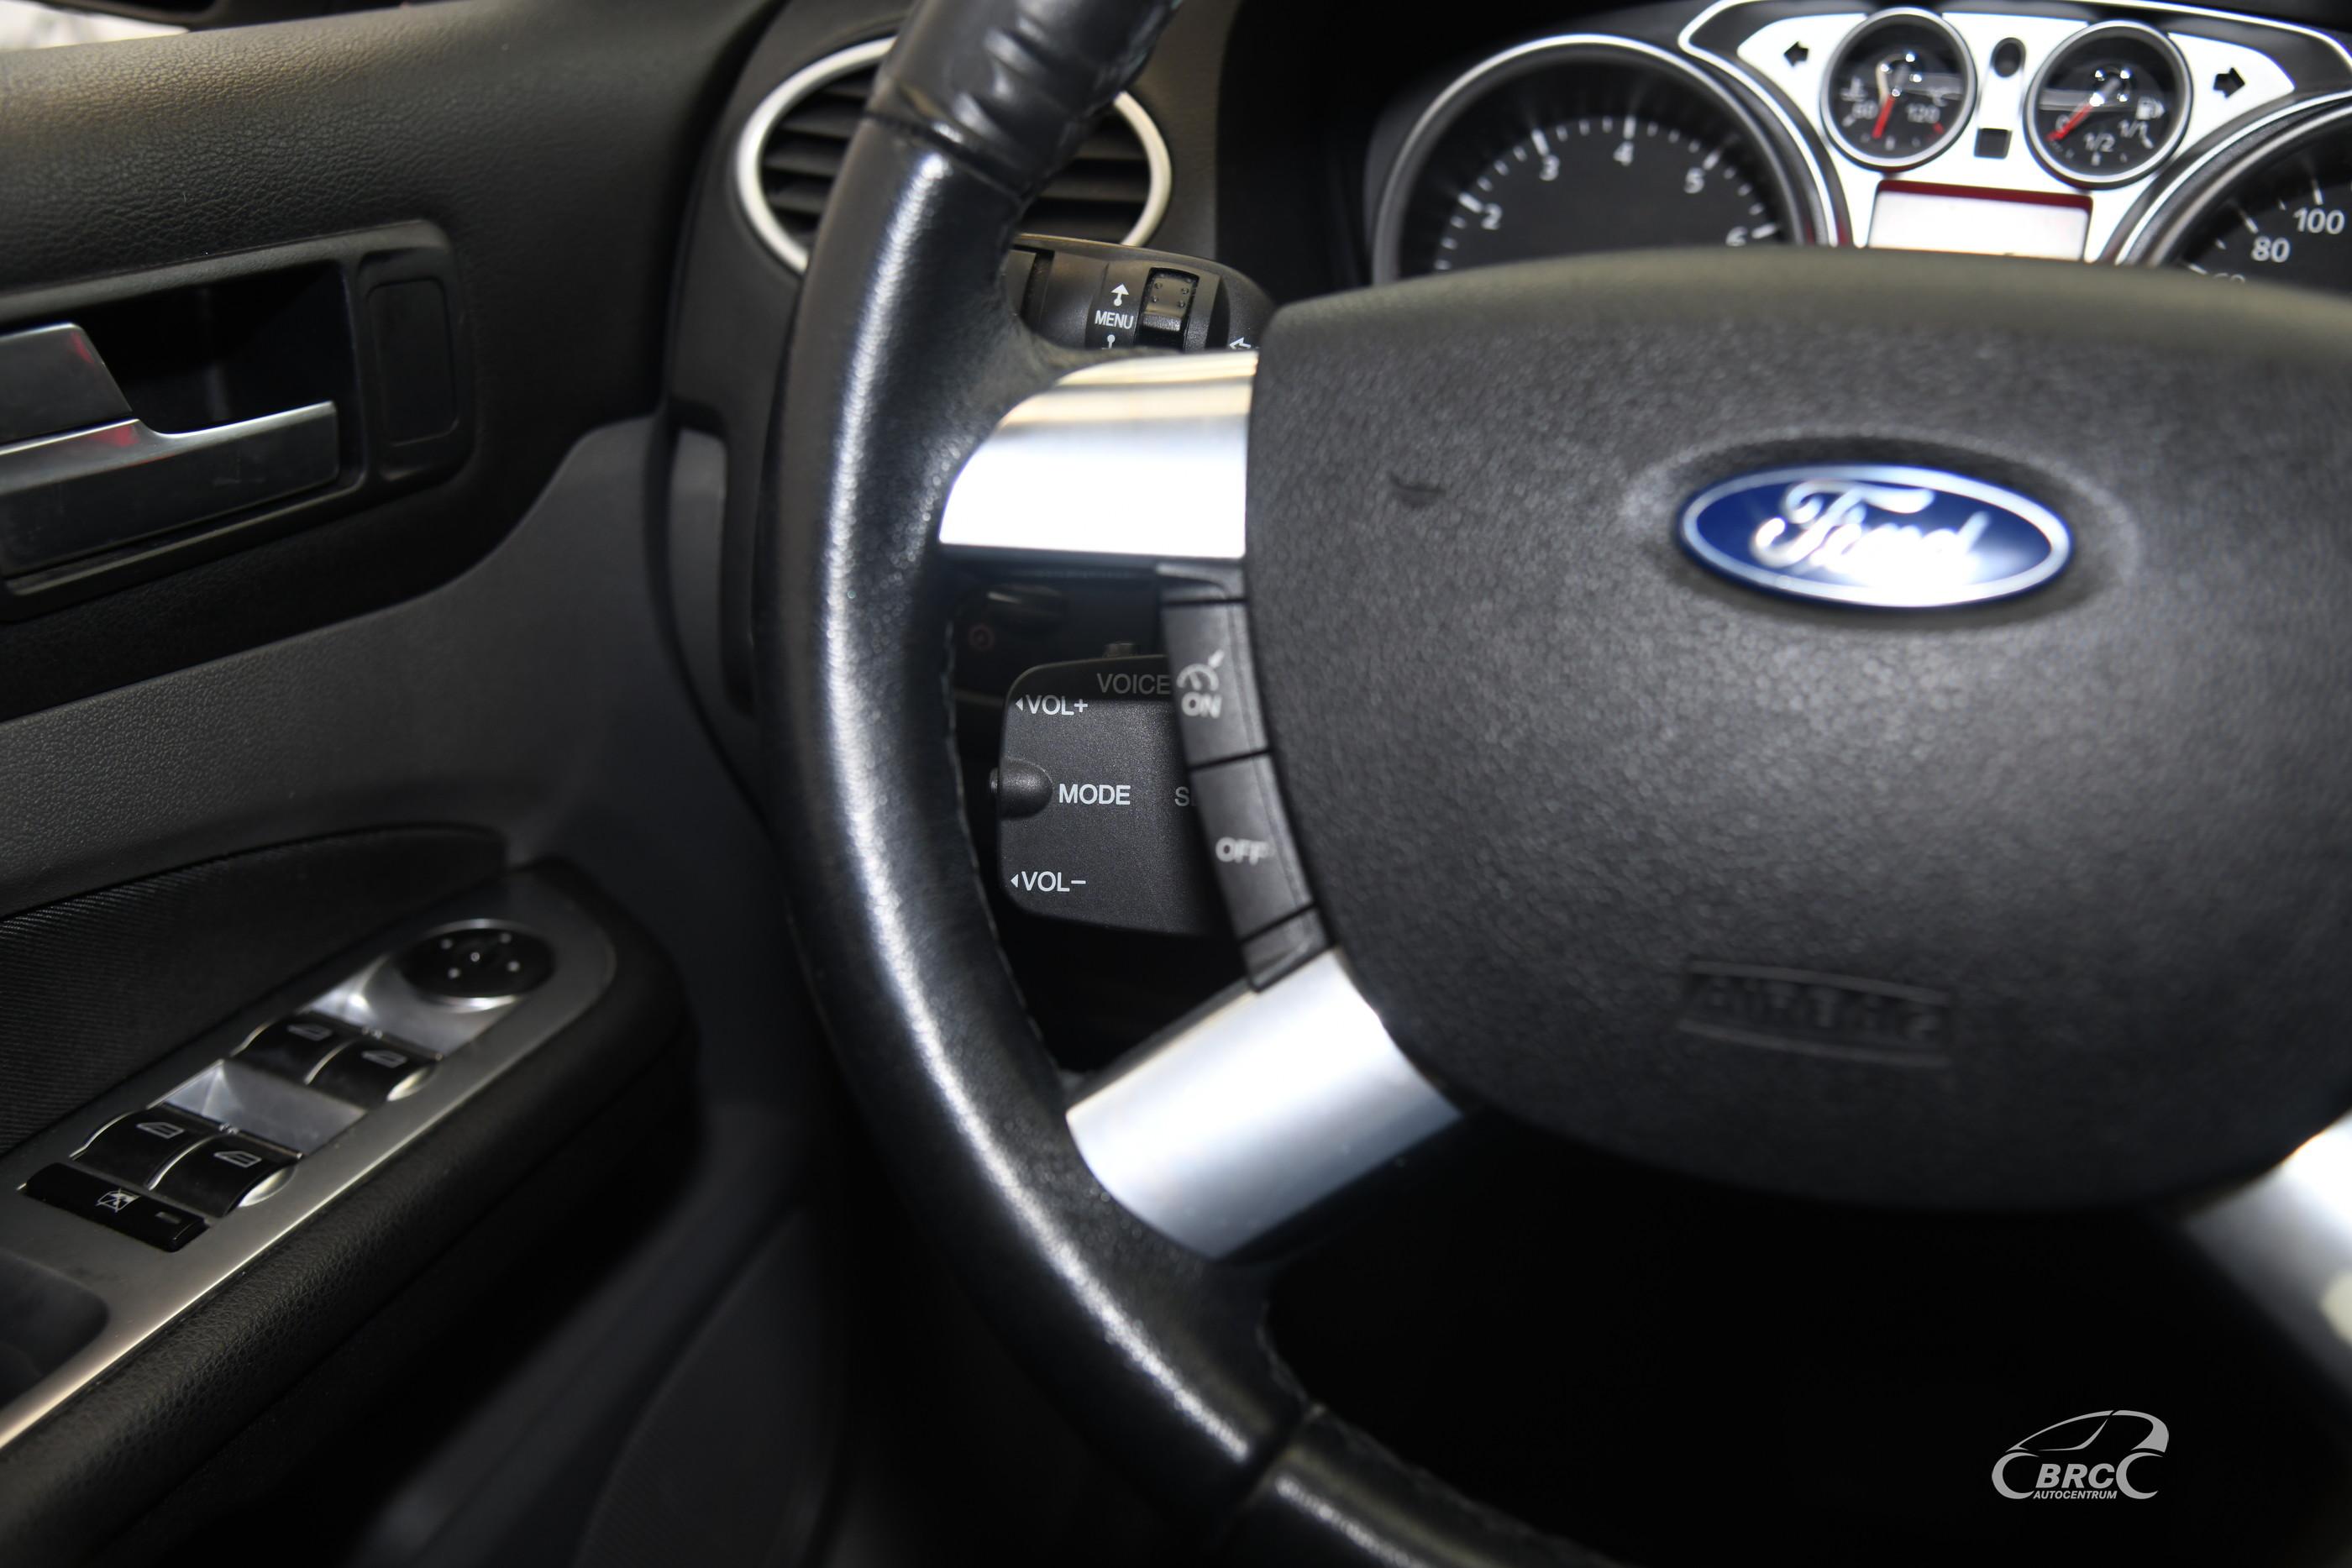 Ford Focus 1.6i Automatas